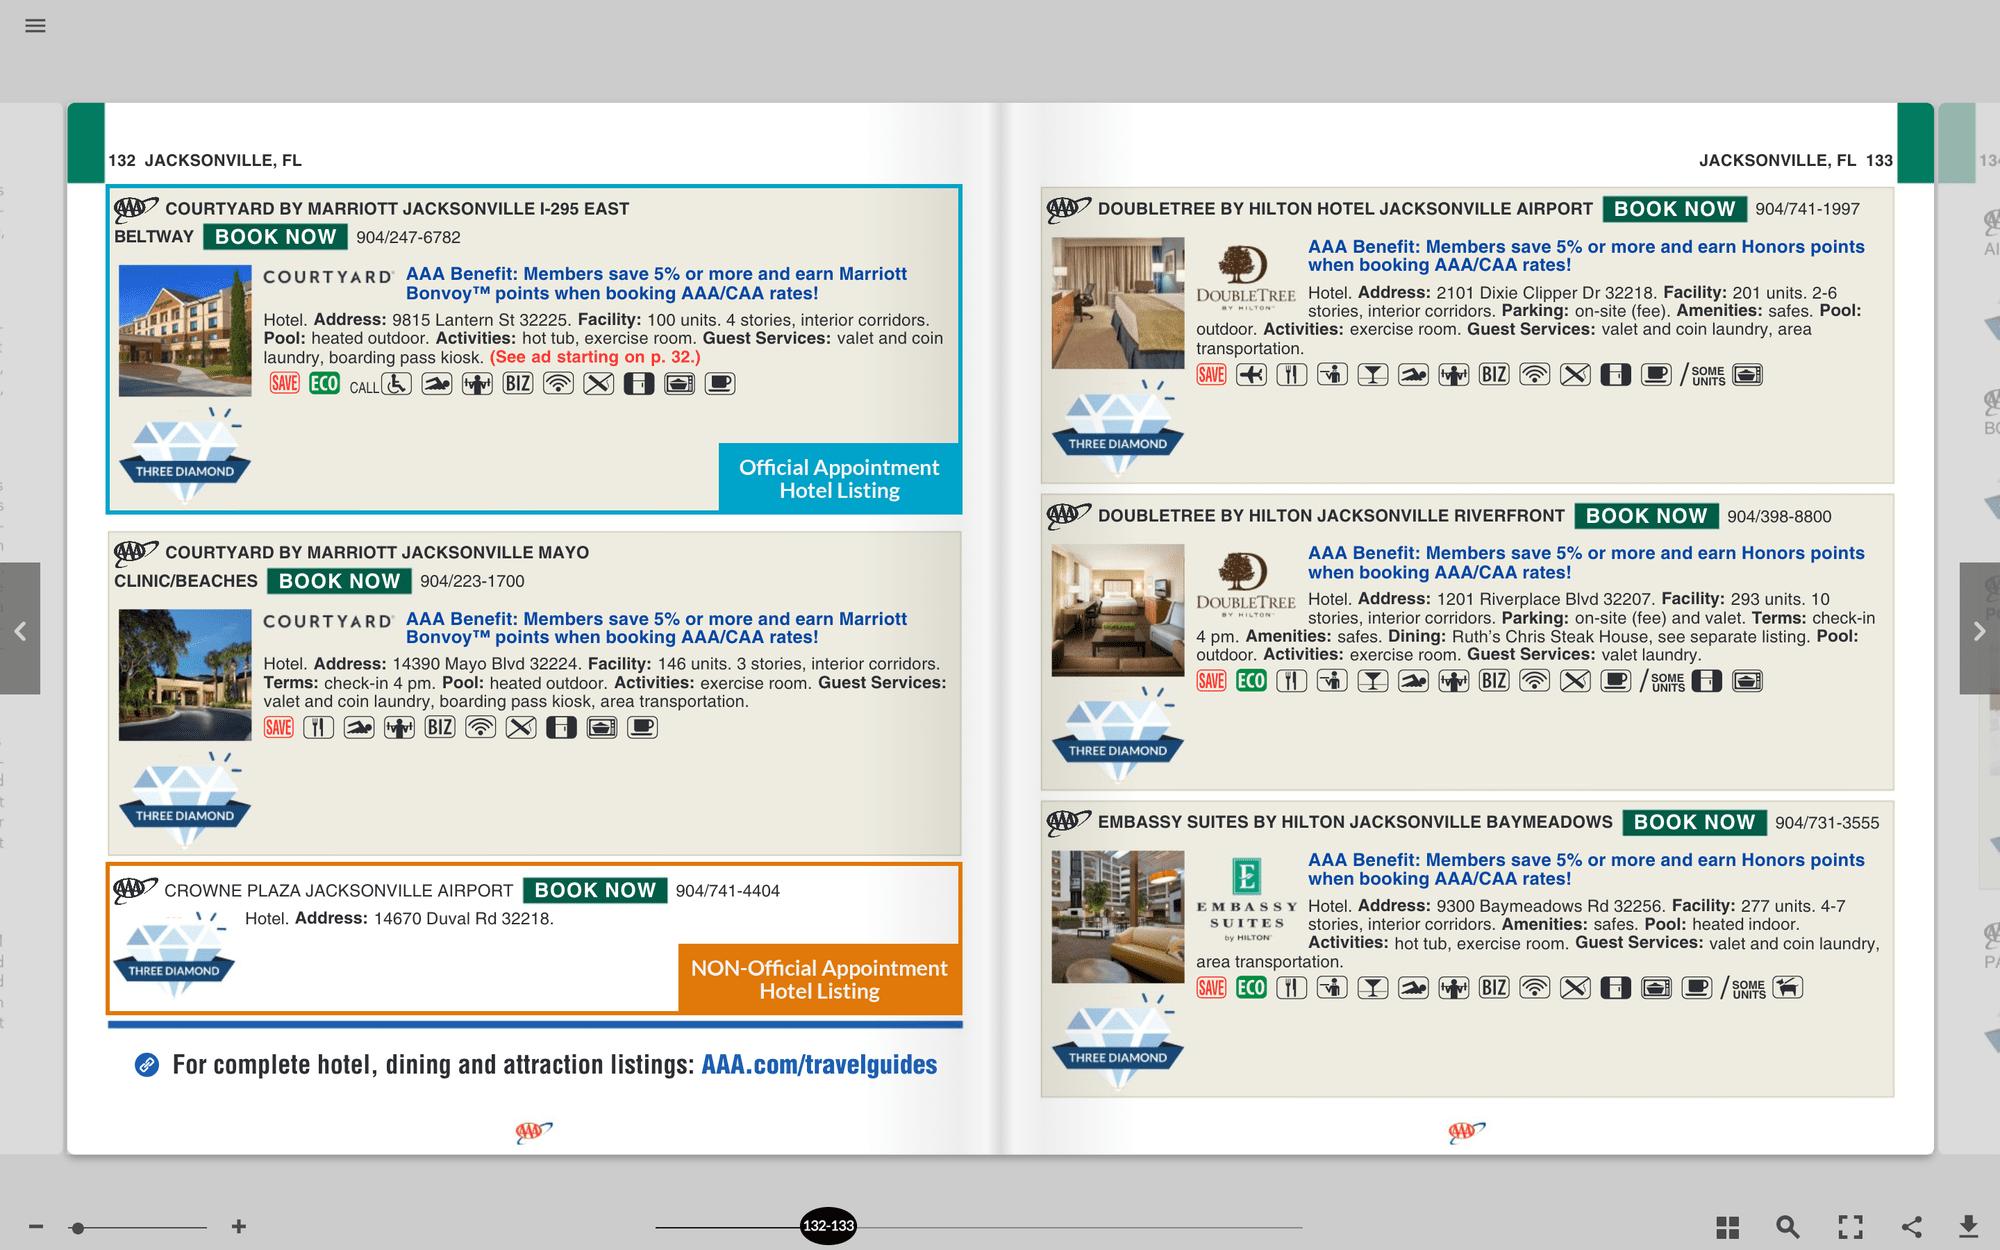 AAA TOURBOOK DISPLAY Lodging Ads